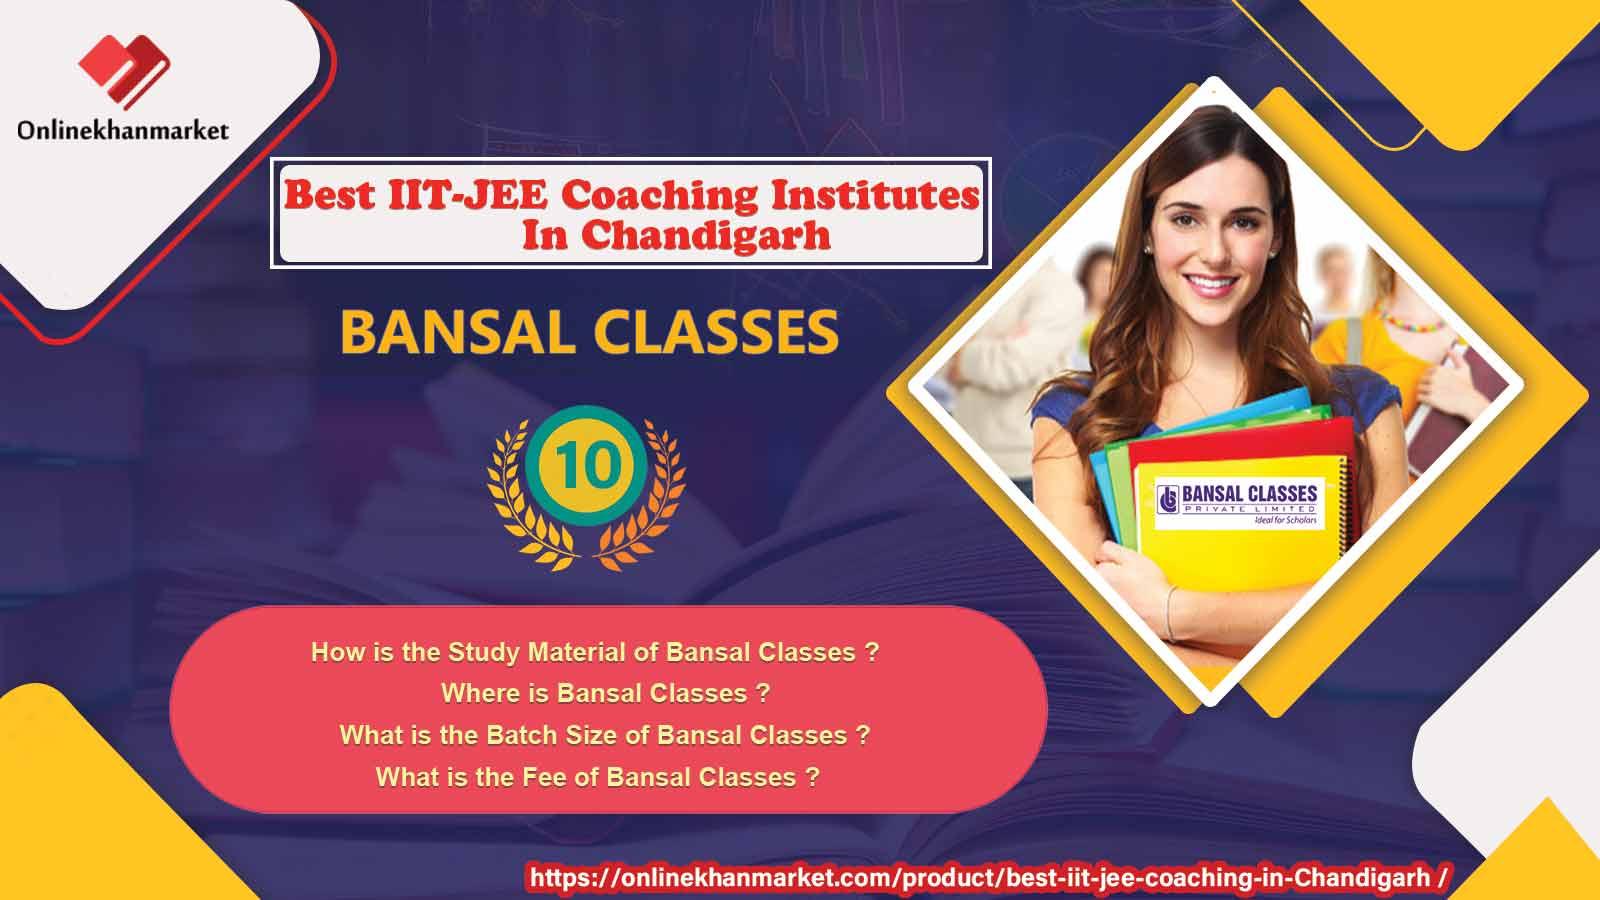 Top IIT Jee Coaching in Chandigarh